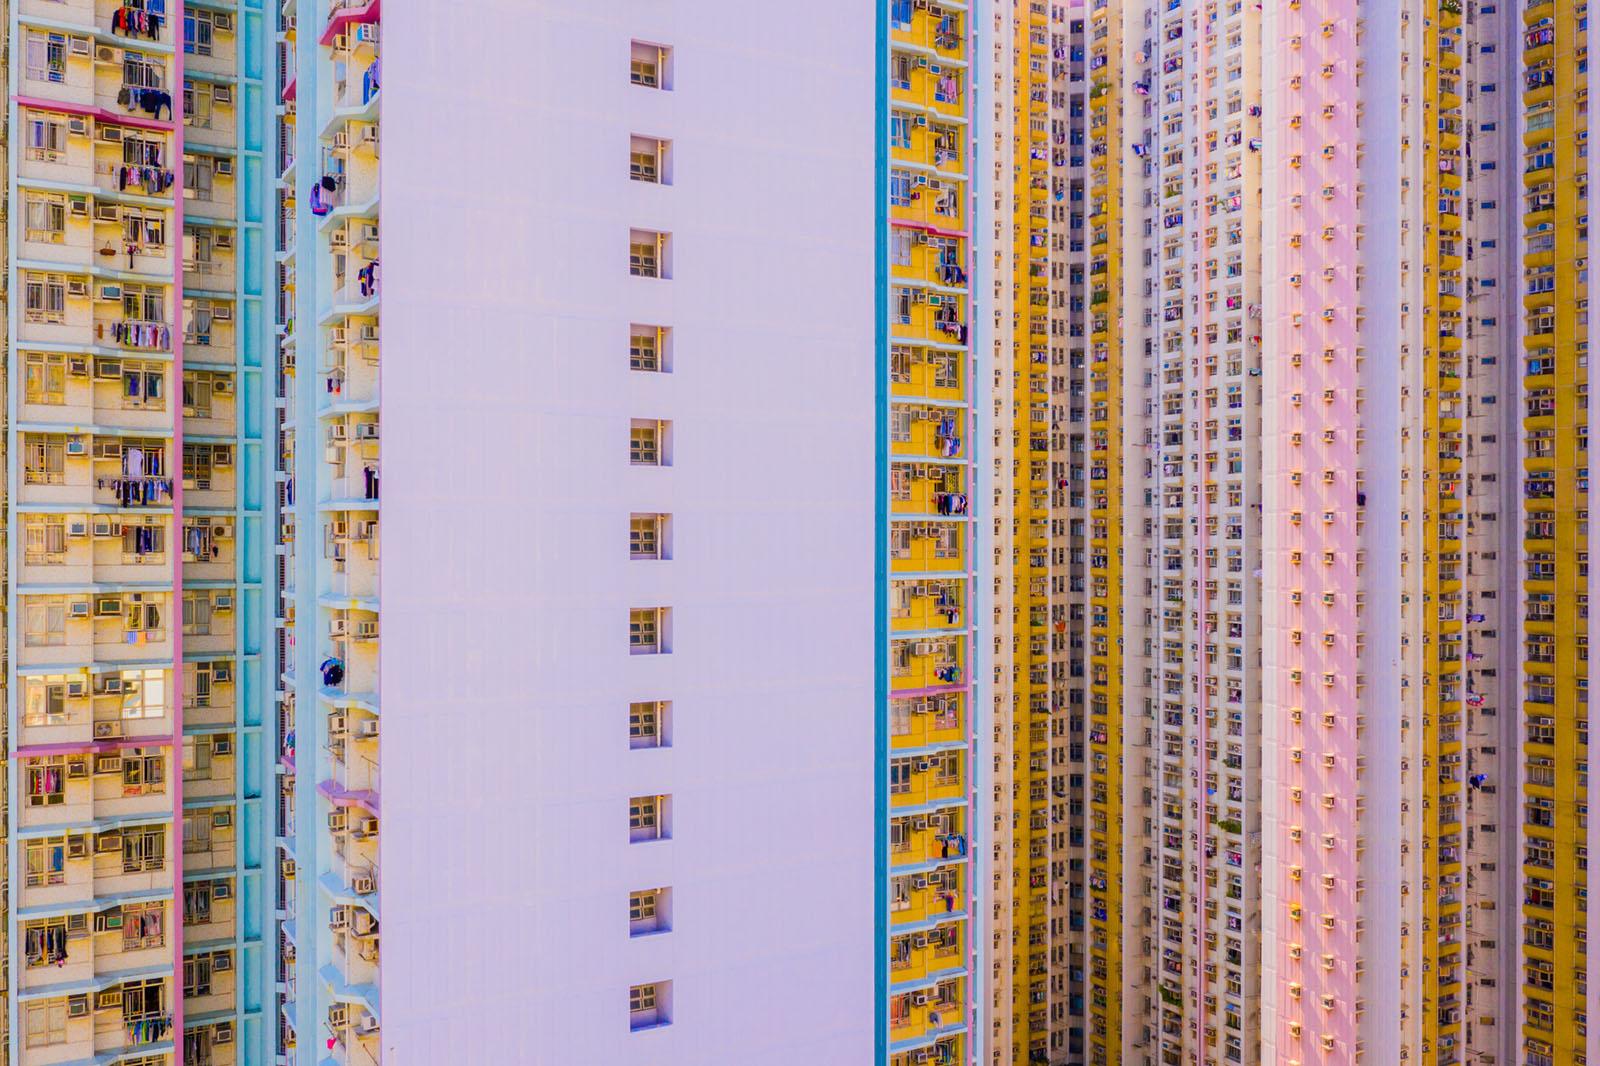 2018, Hong Kong, abstract, aerial, apartments, block tower, china, complex, drone, estates, highrise, homes, housing, kowloon...